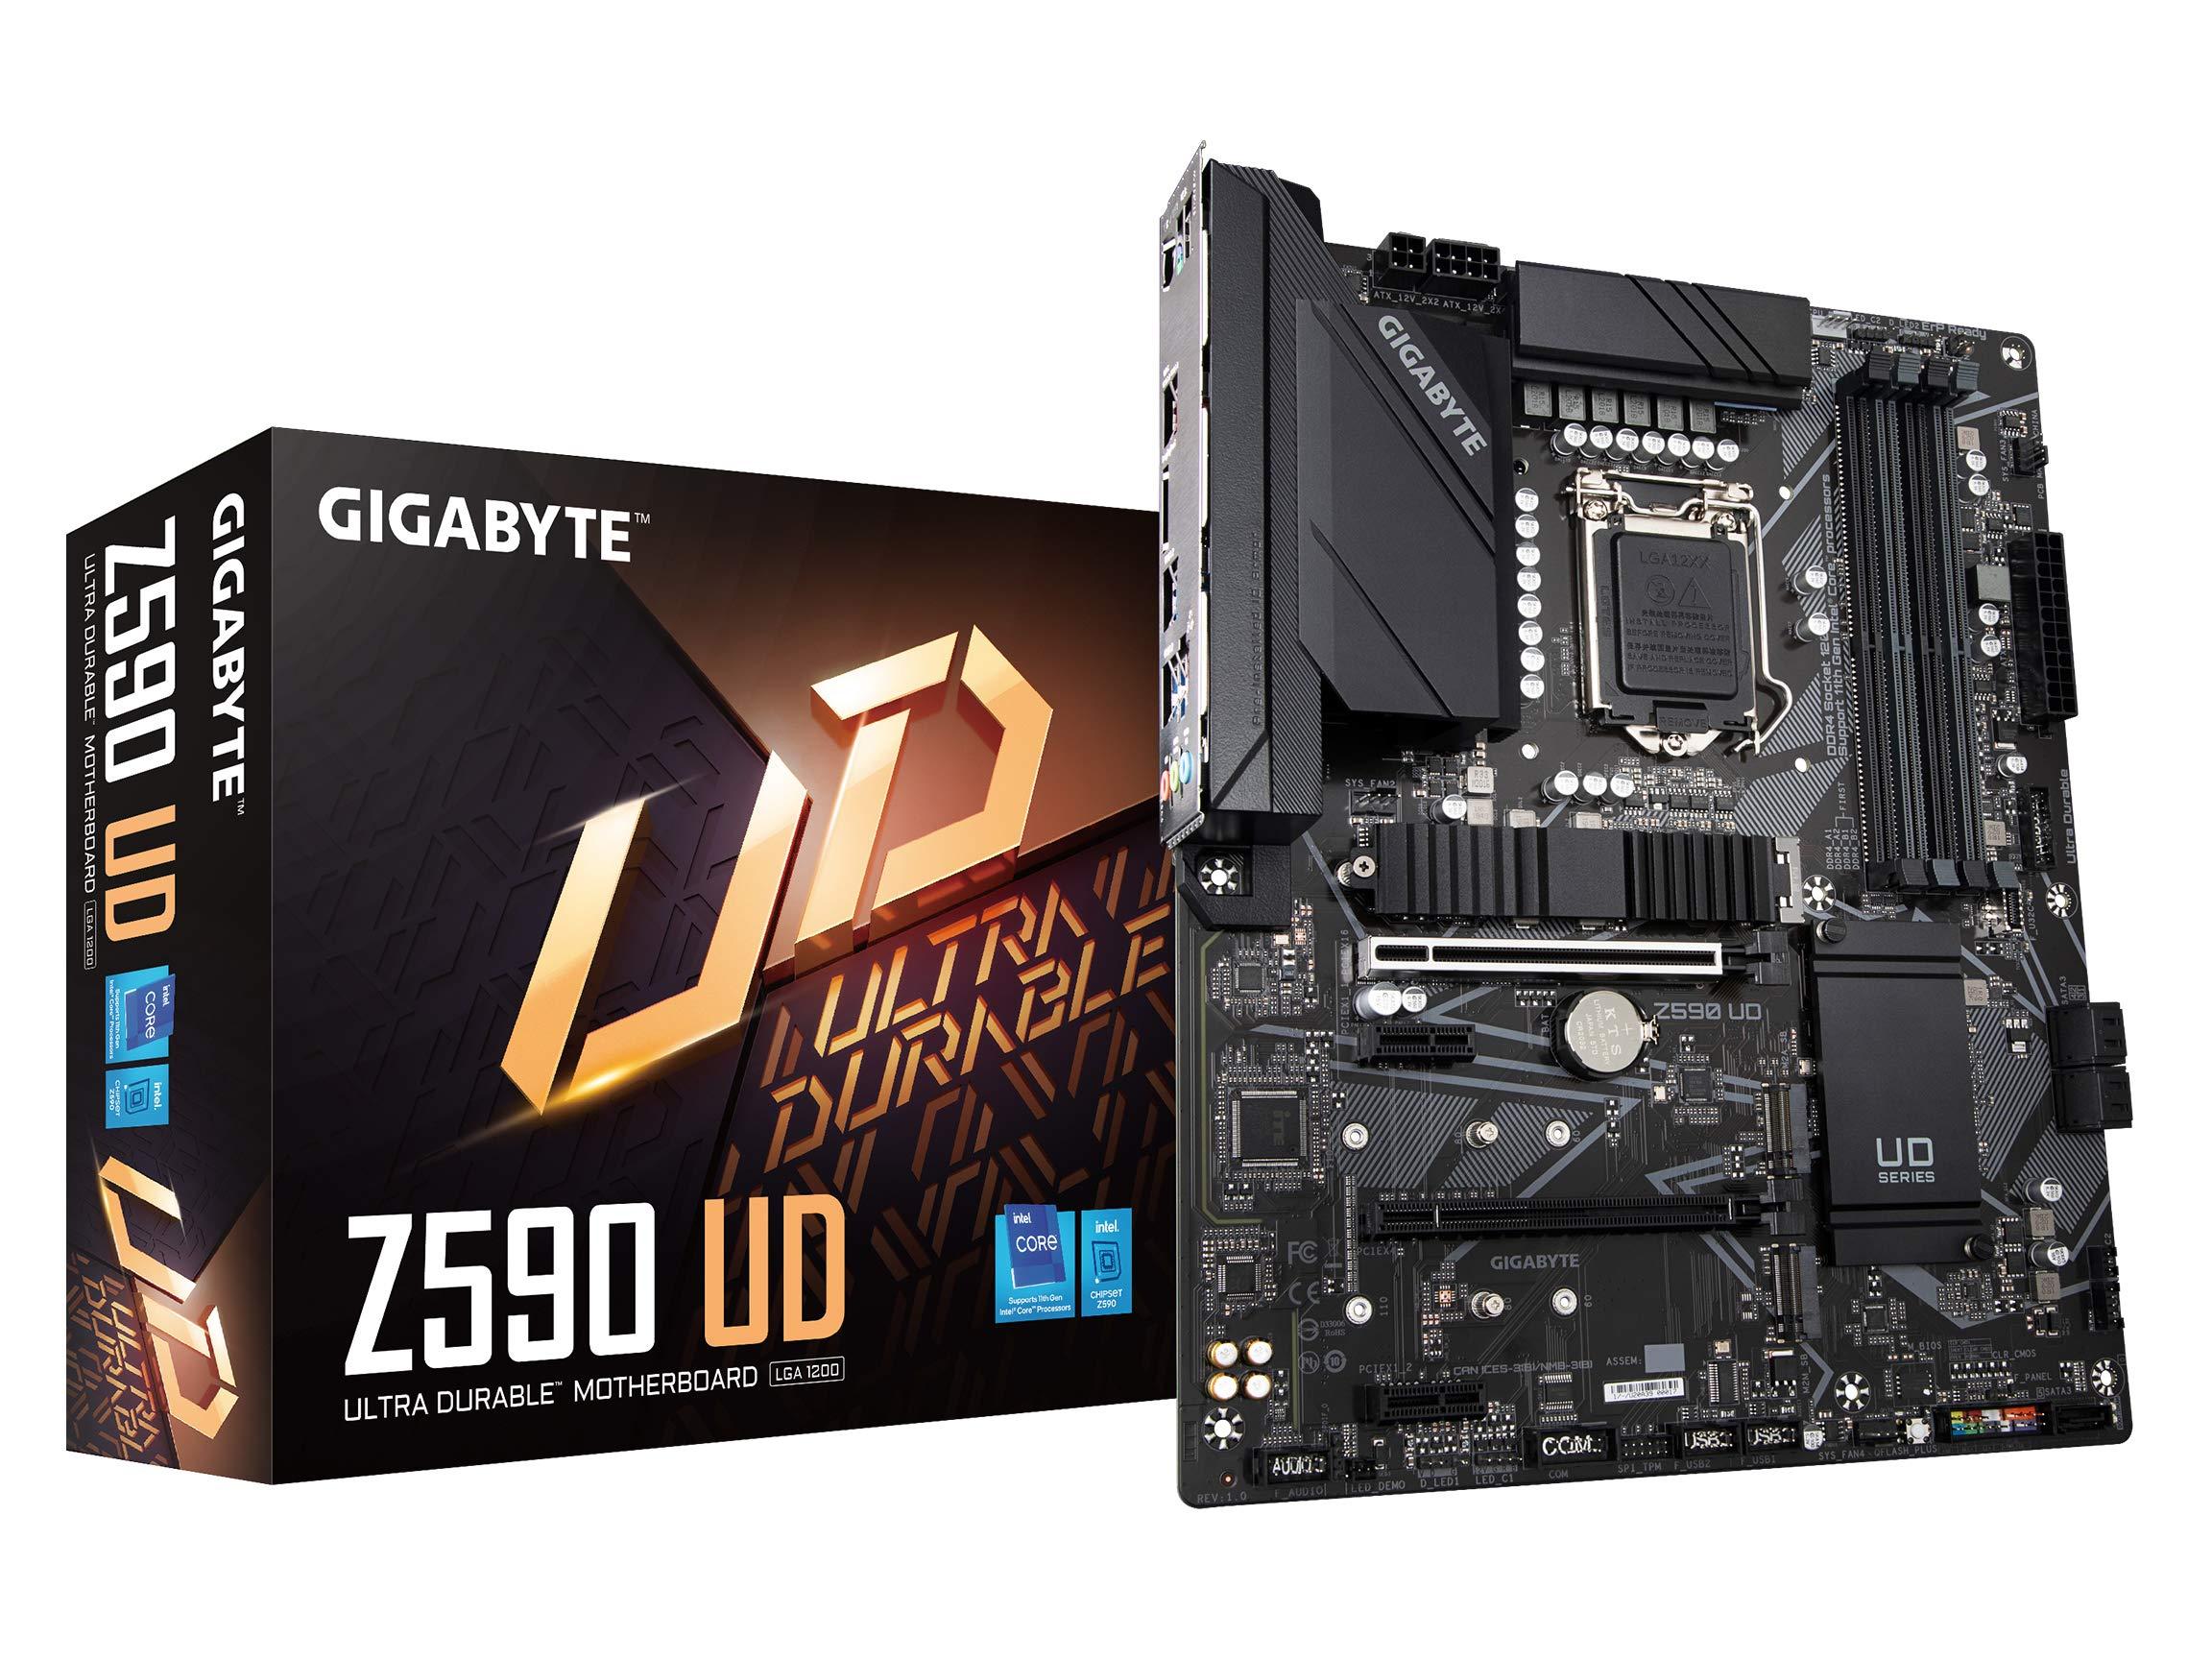 GIGABYTE Z590 UD (LGA 1200/ Intel Z590/ ATX/ Triple M.2/ PCI